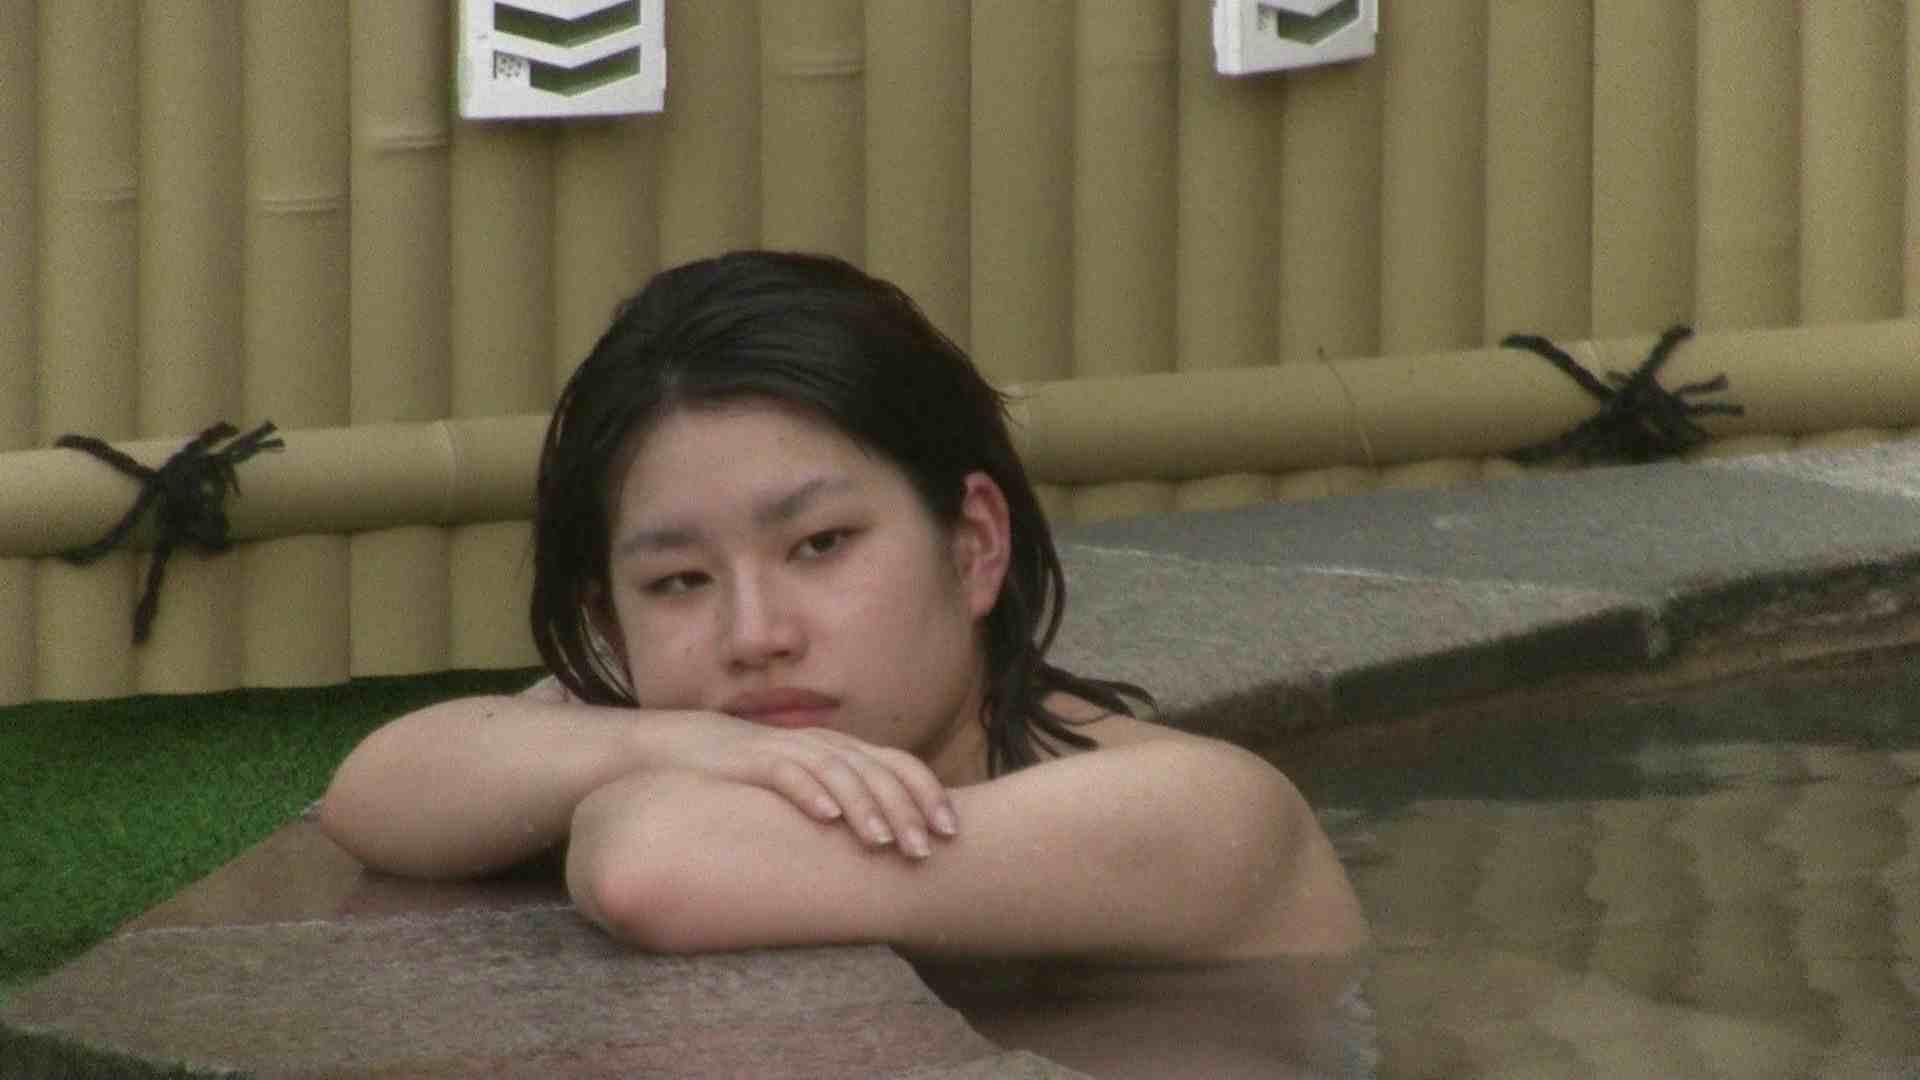 Aquaな露天風呂Vol.230 HなOL | 盗撮  83pic 28